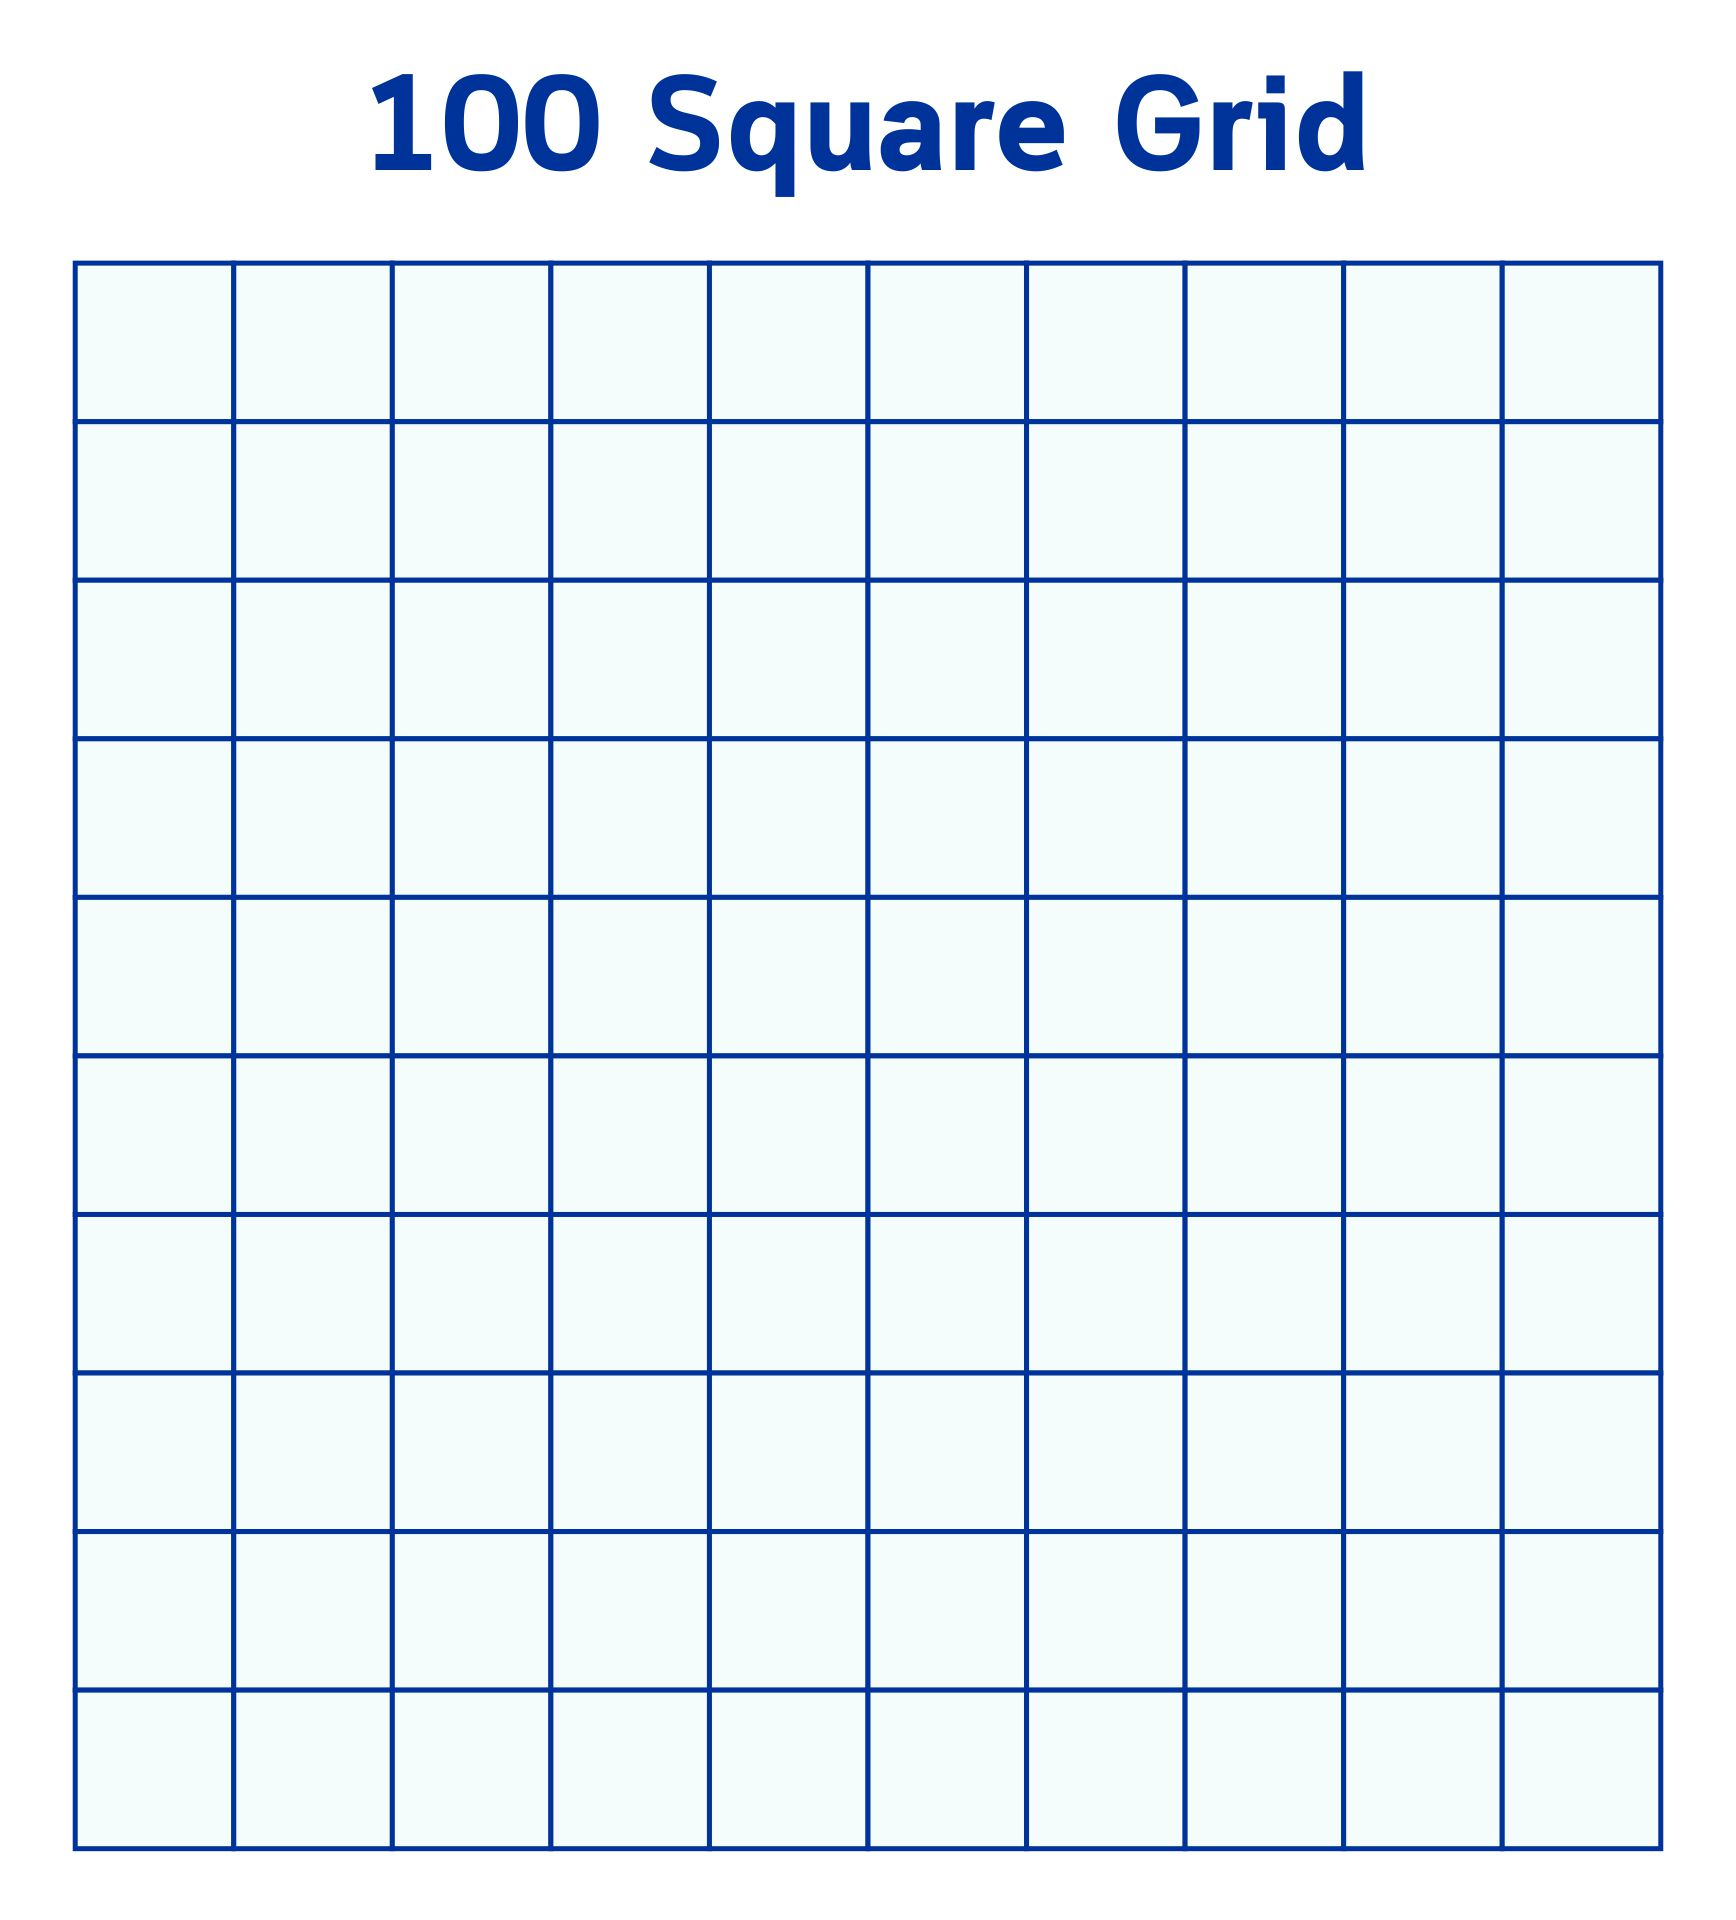 ... Printable 100 Square, Hundred Printable 100 Square Grid and Printable